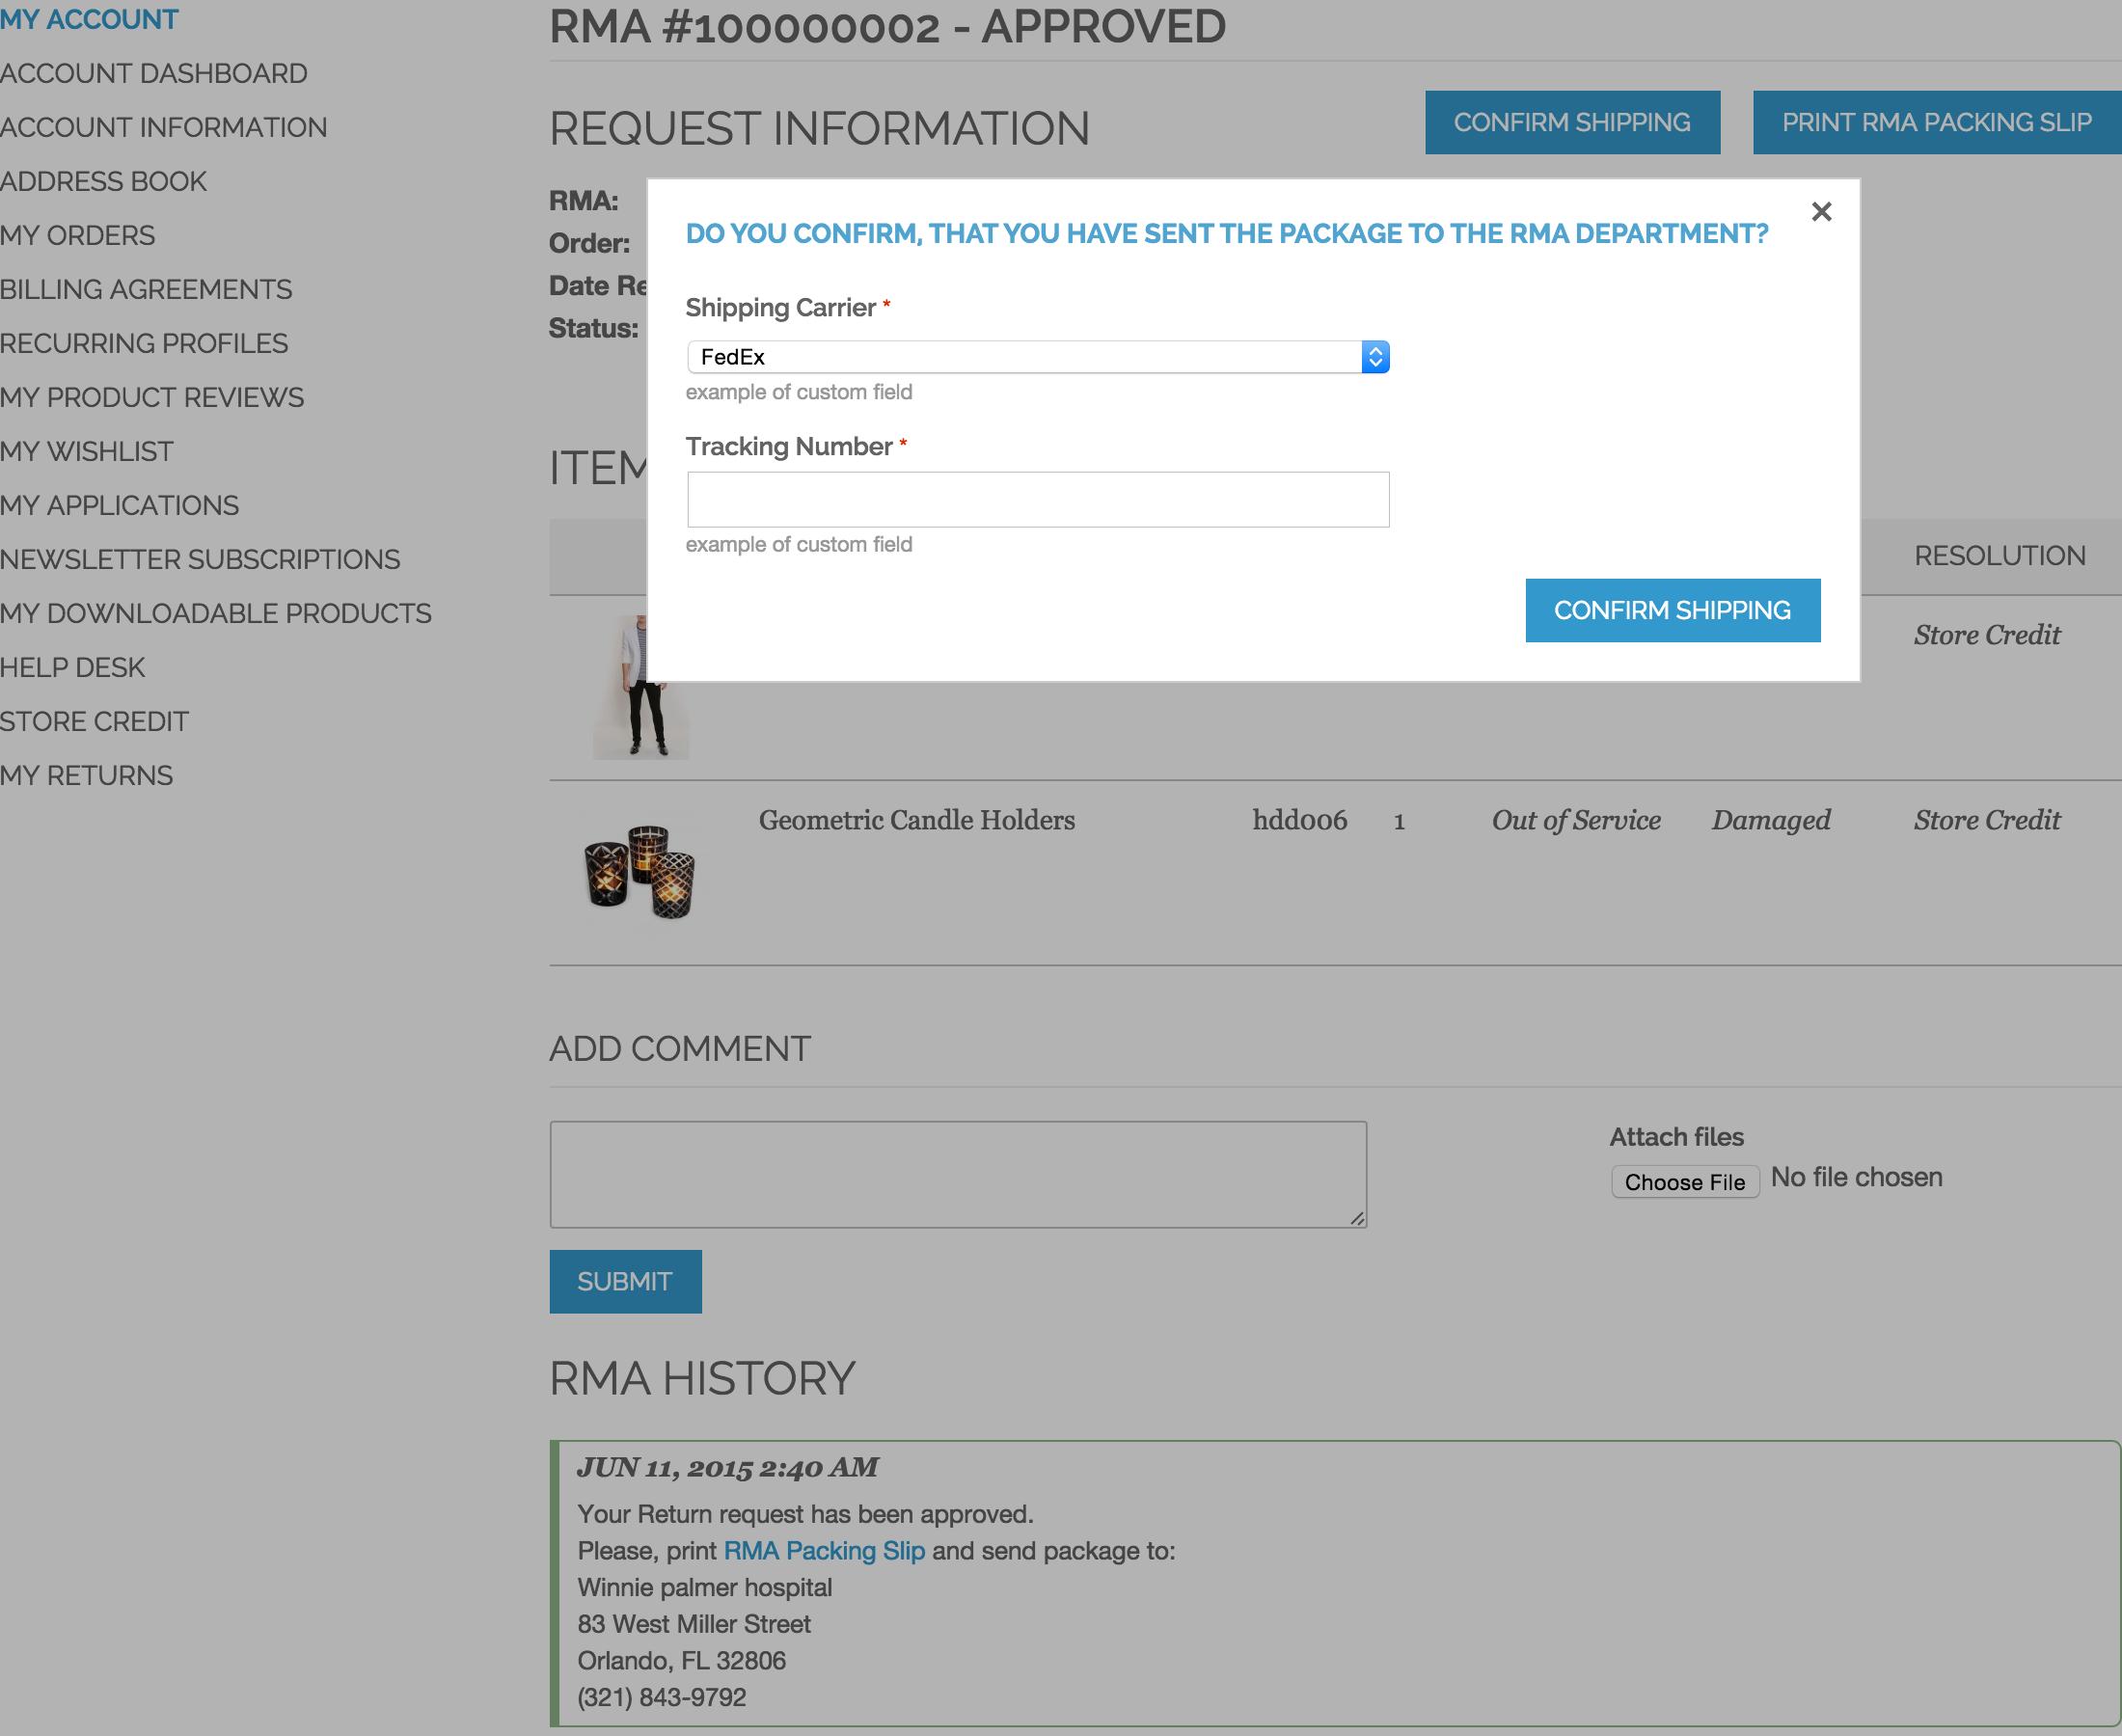 Customer RMA - Sent Confirmaiton